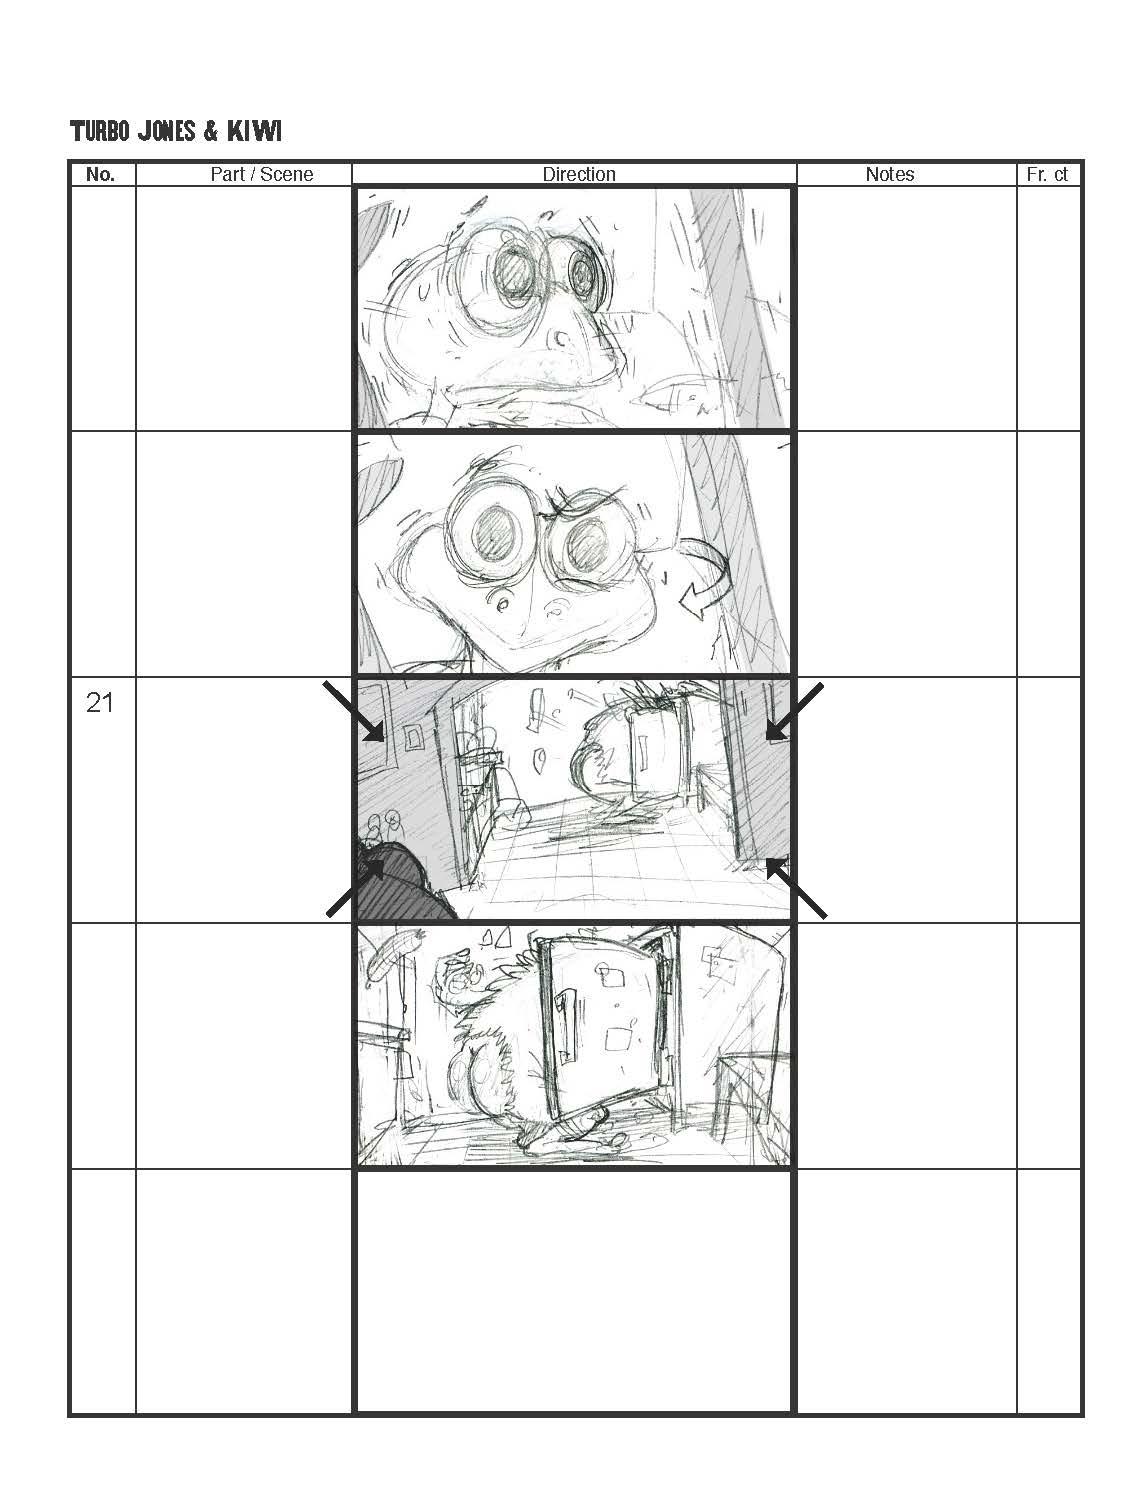 TJK_Storyboards_v01_HIGH_Page_10.jpg